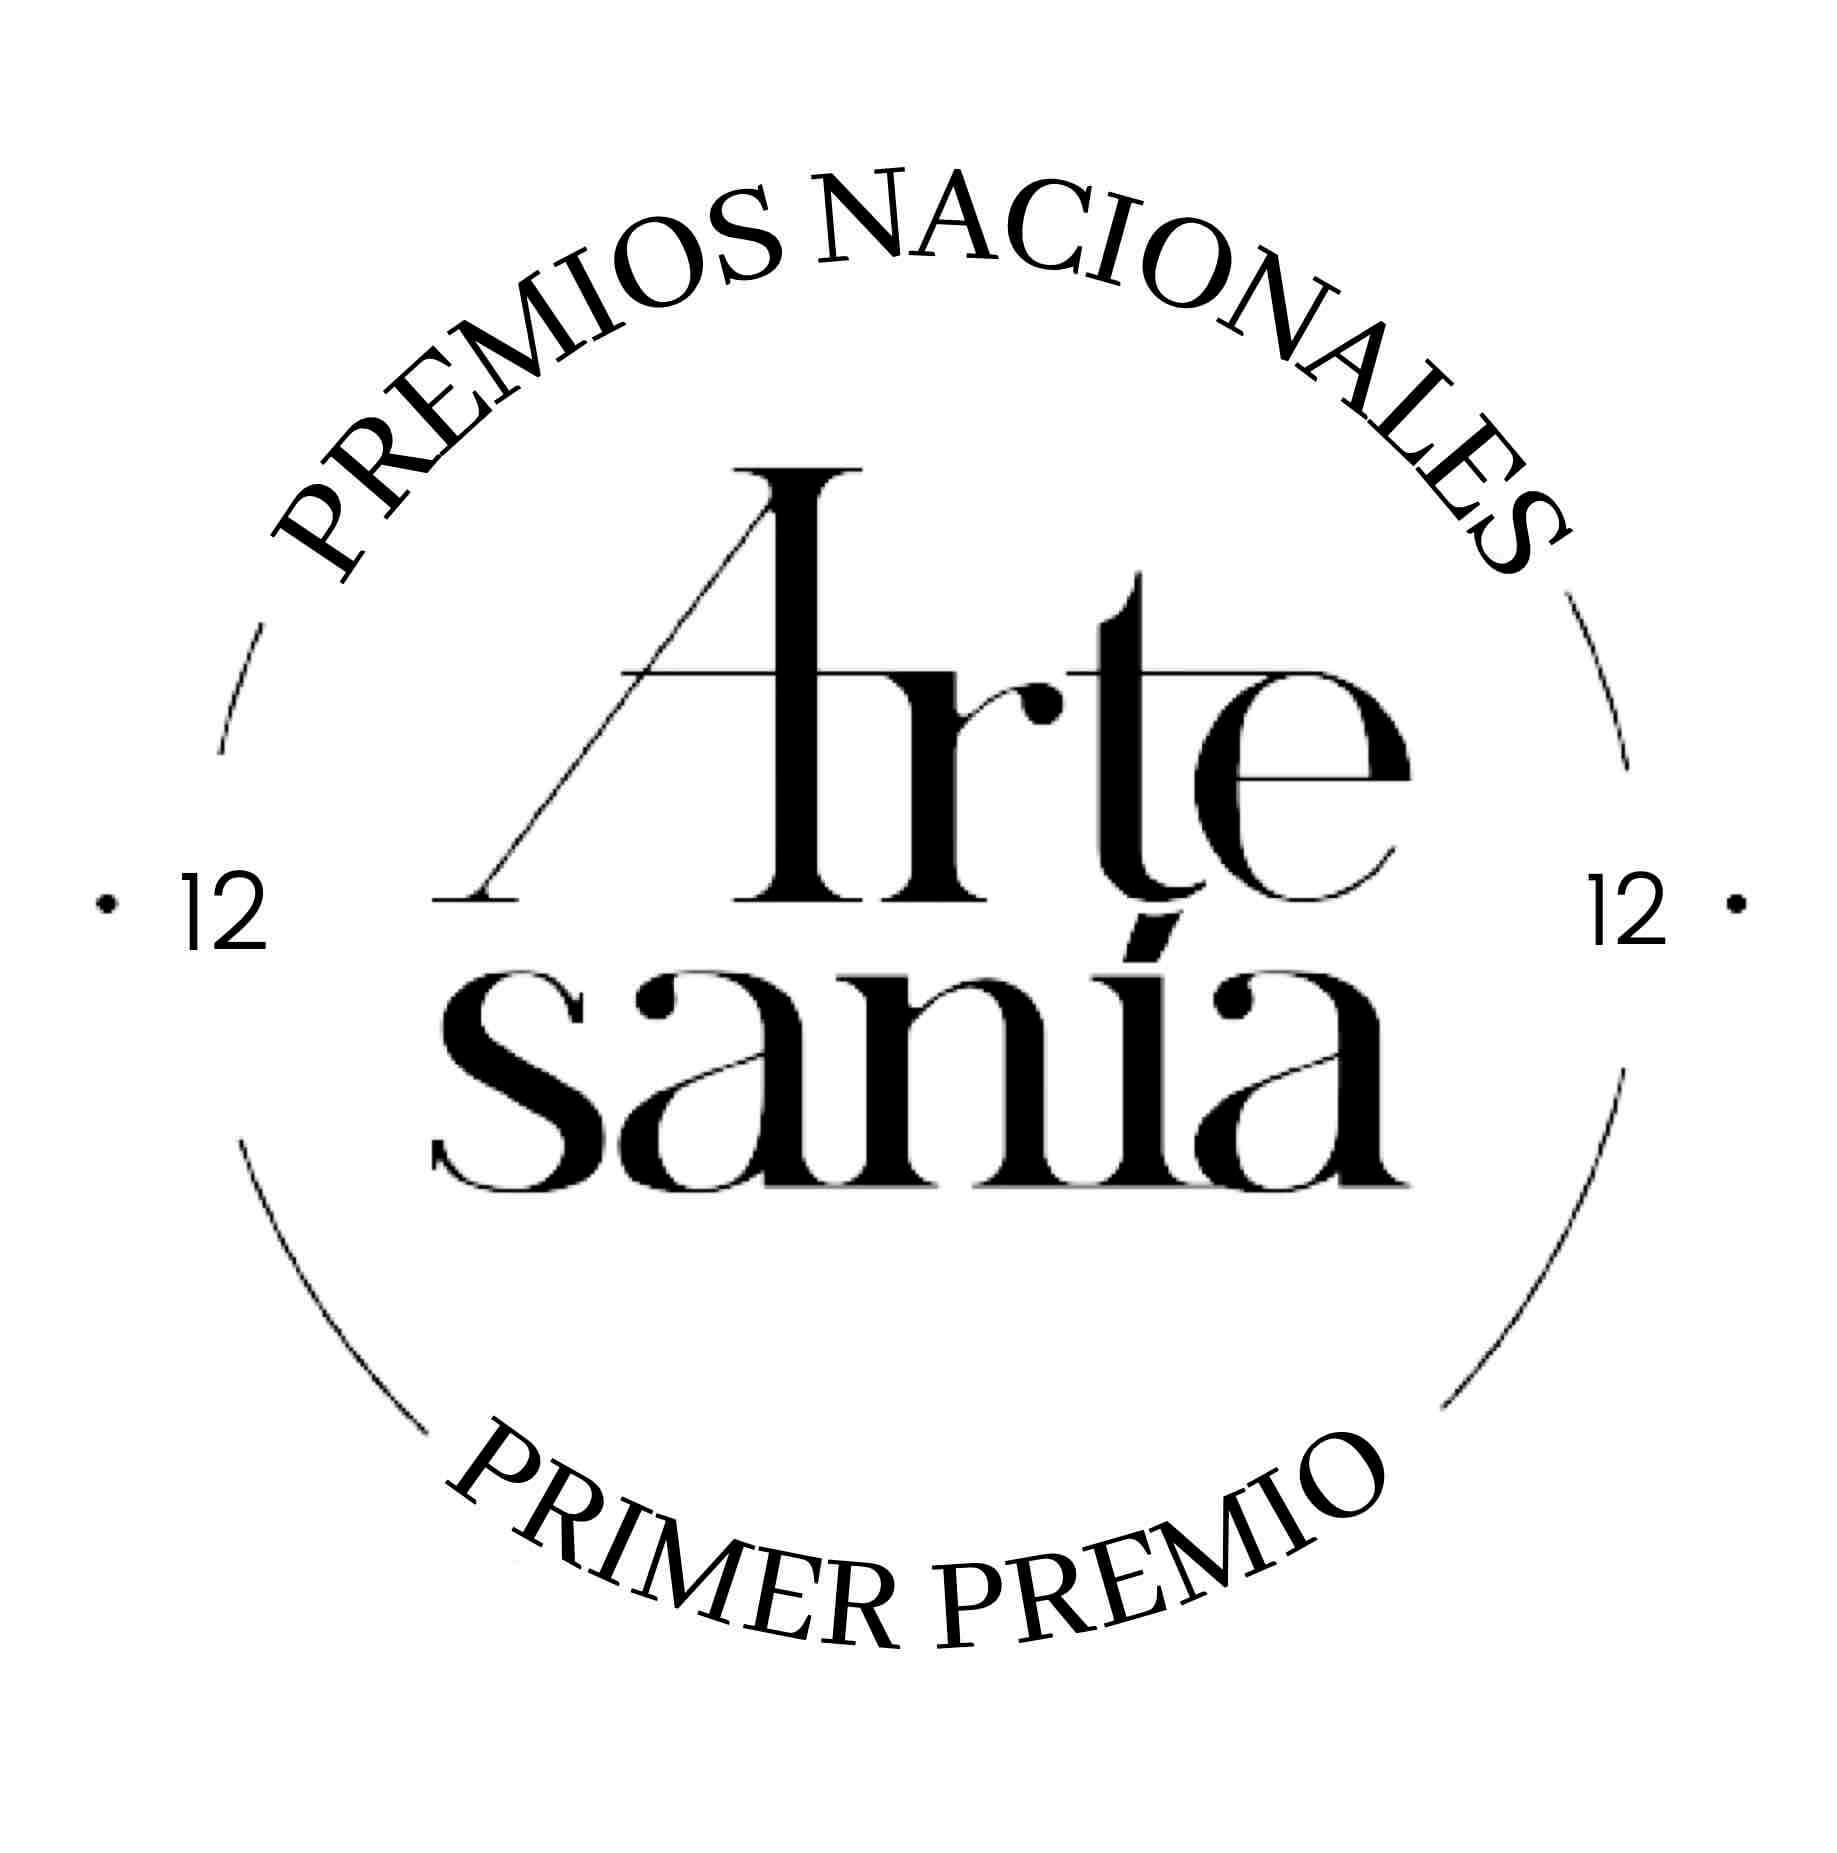 Primer Premio Nacional de Artesania 2012 - Empresa